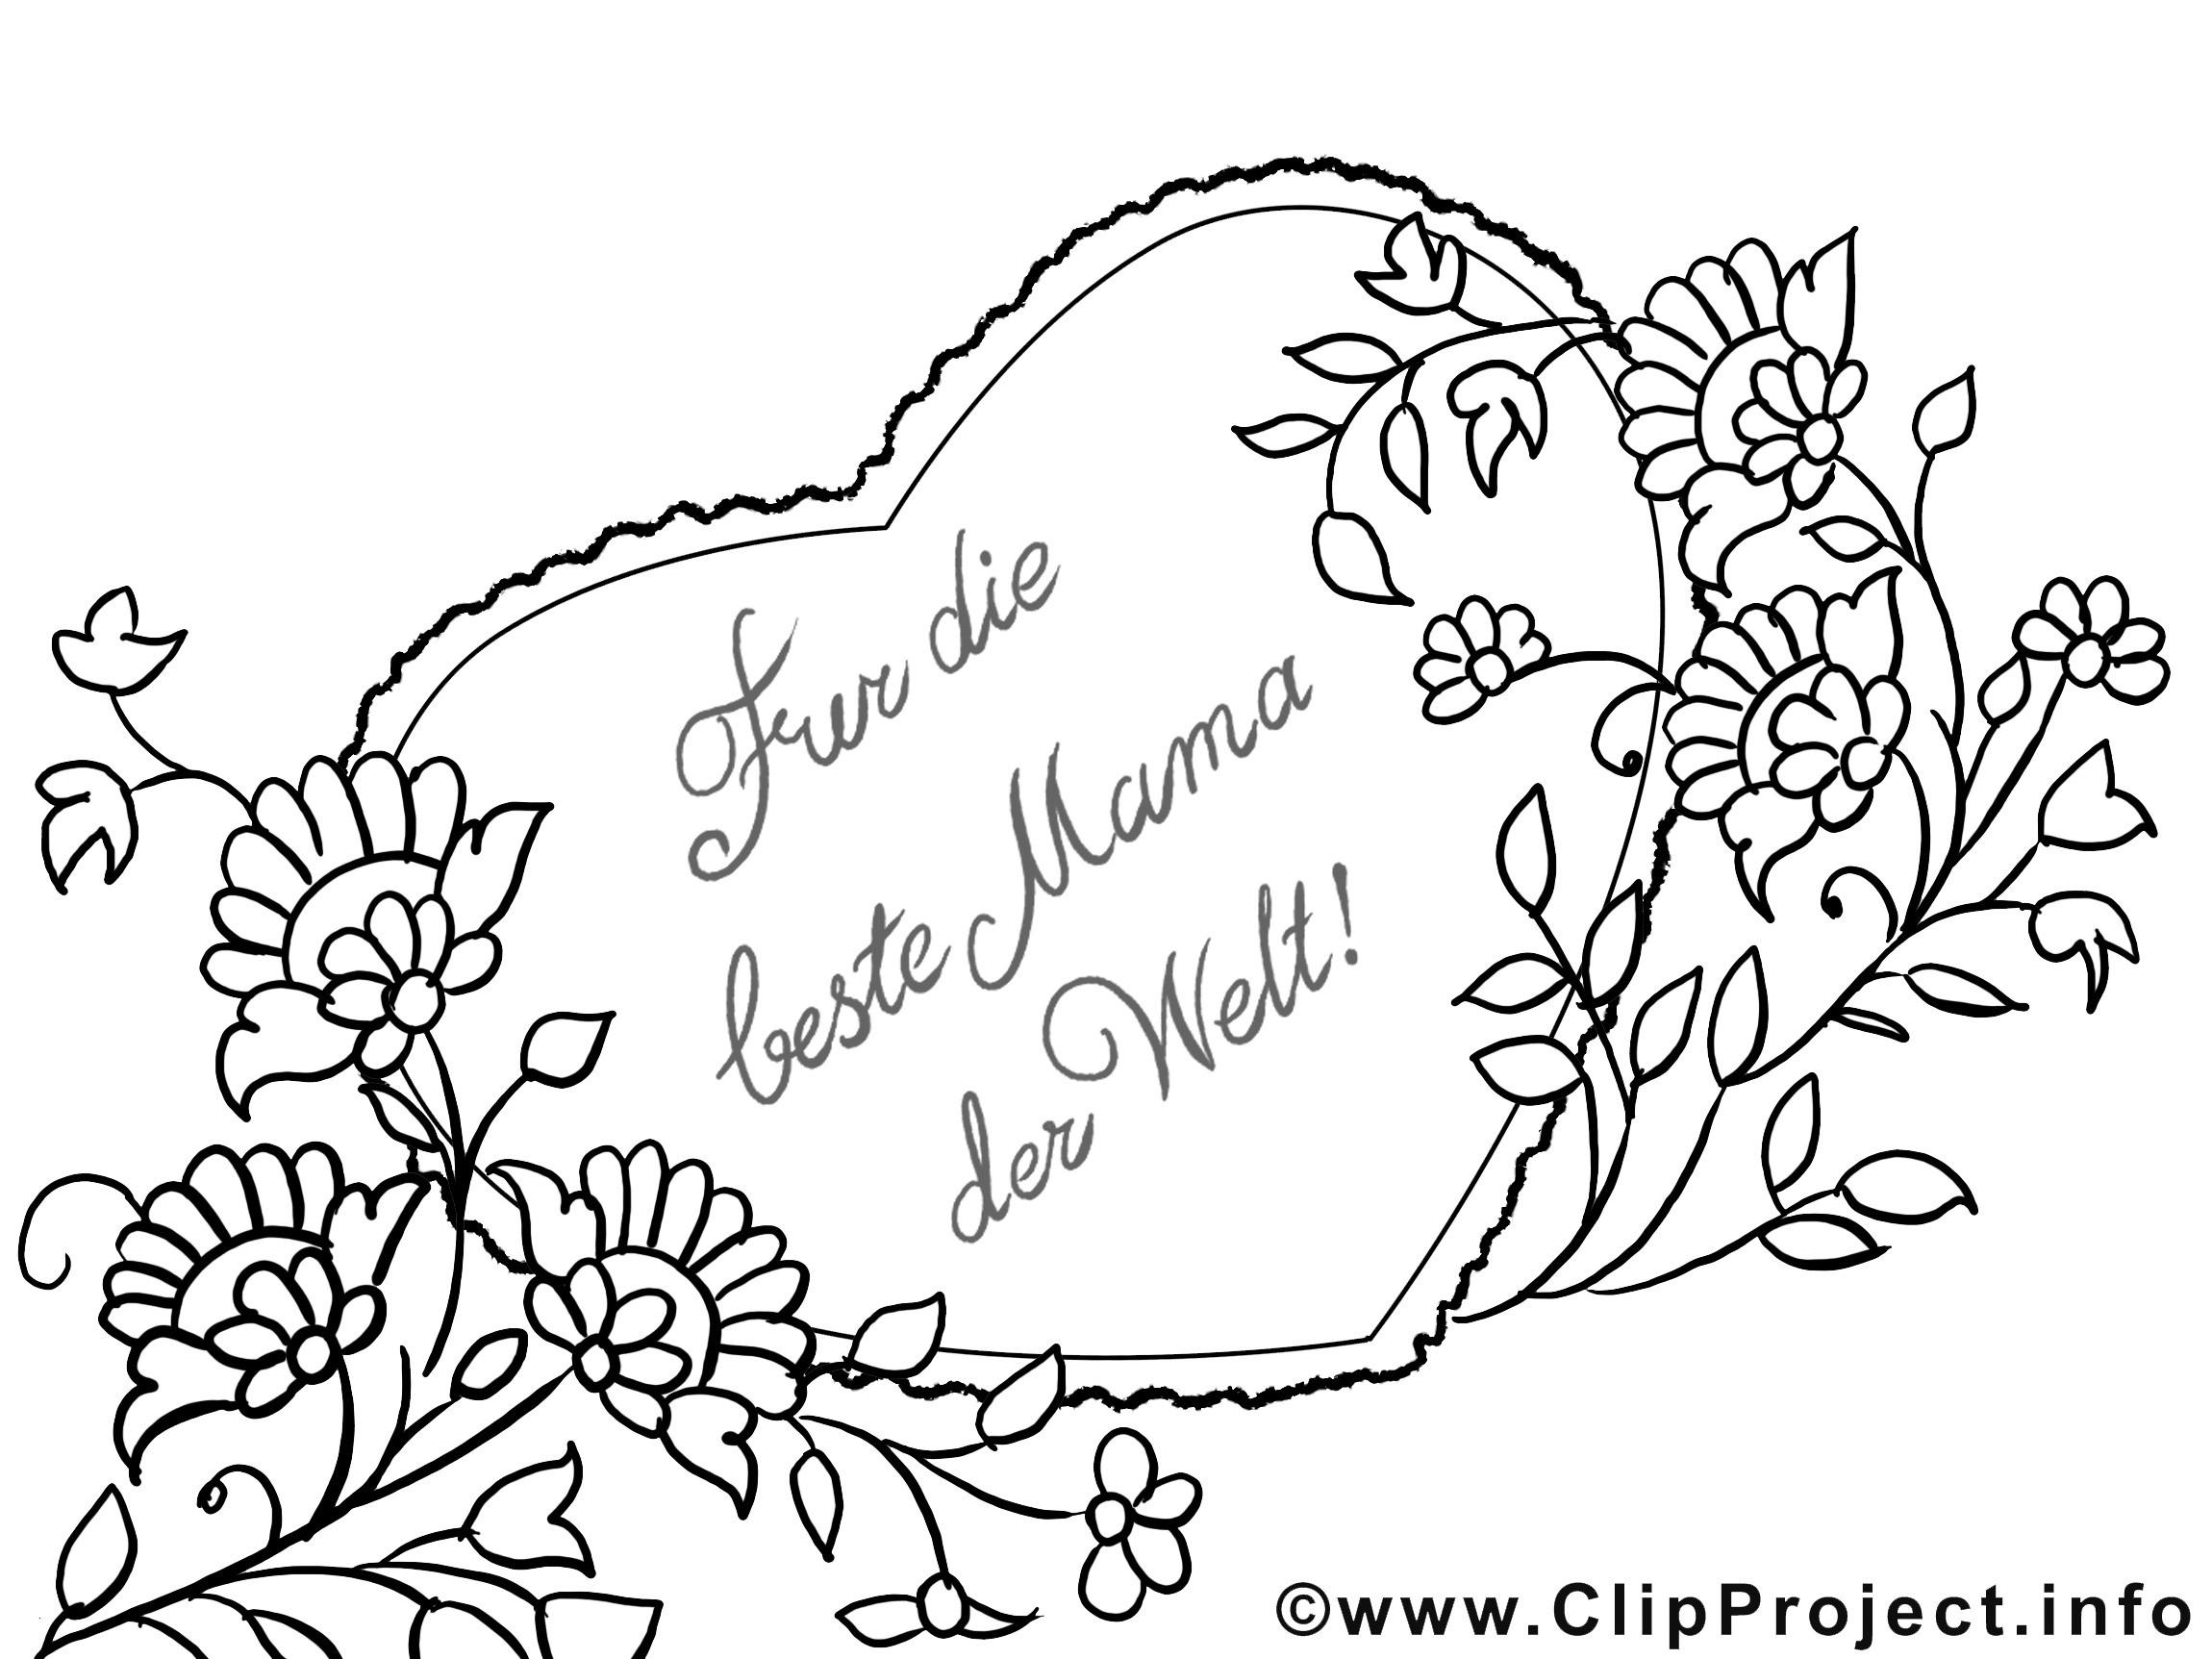 Mandalas Zum Ausdrucken Herzen Neu Muttertag Mandala ¢ ¦ Herz & ornament Ausmalen Mandala Einzigartig Sammlung